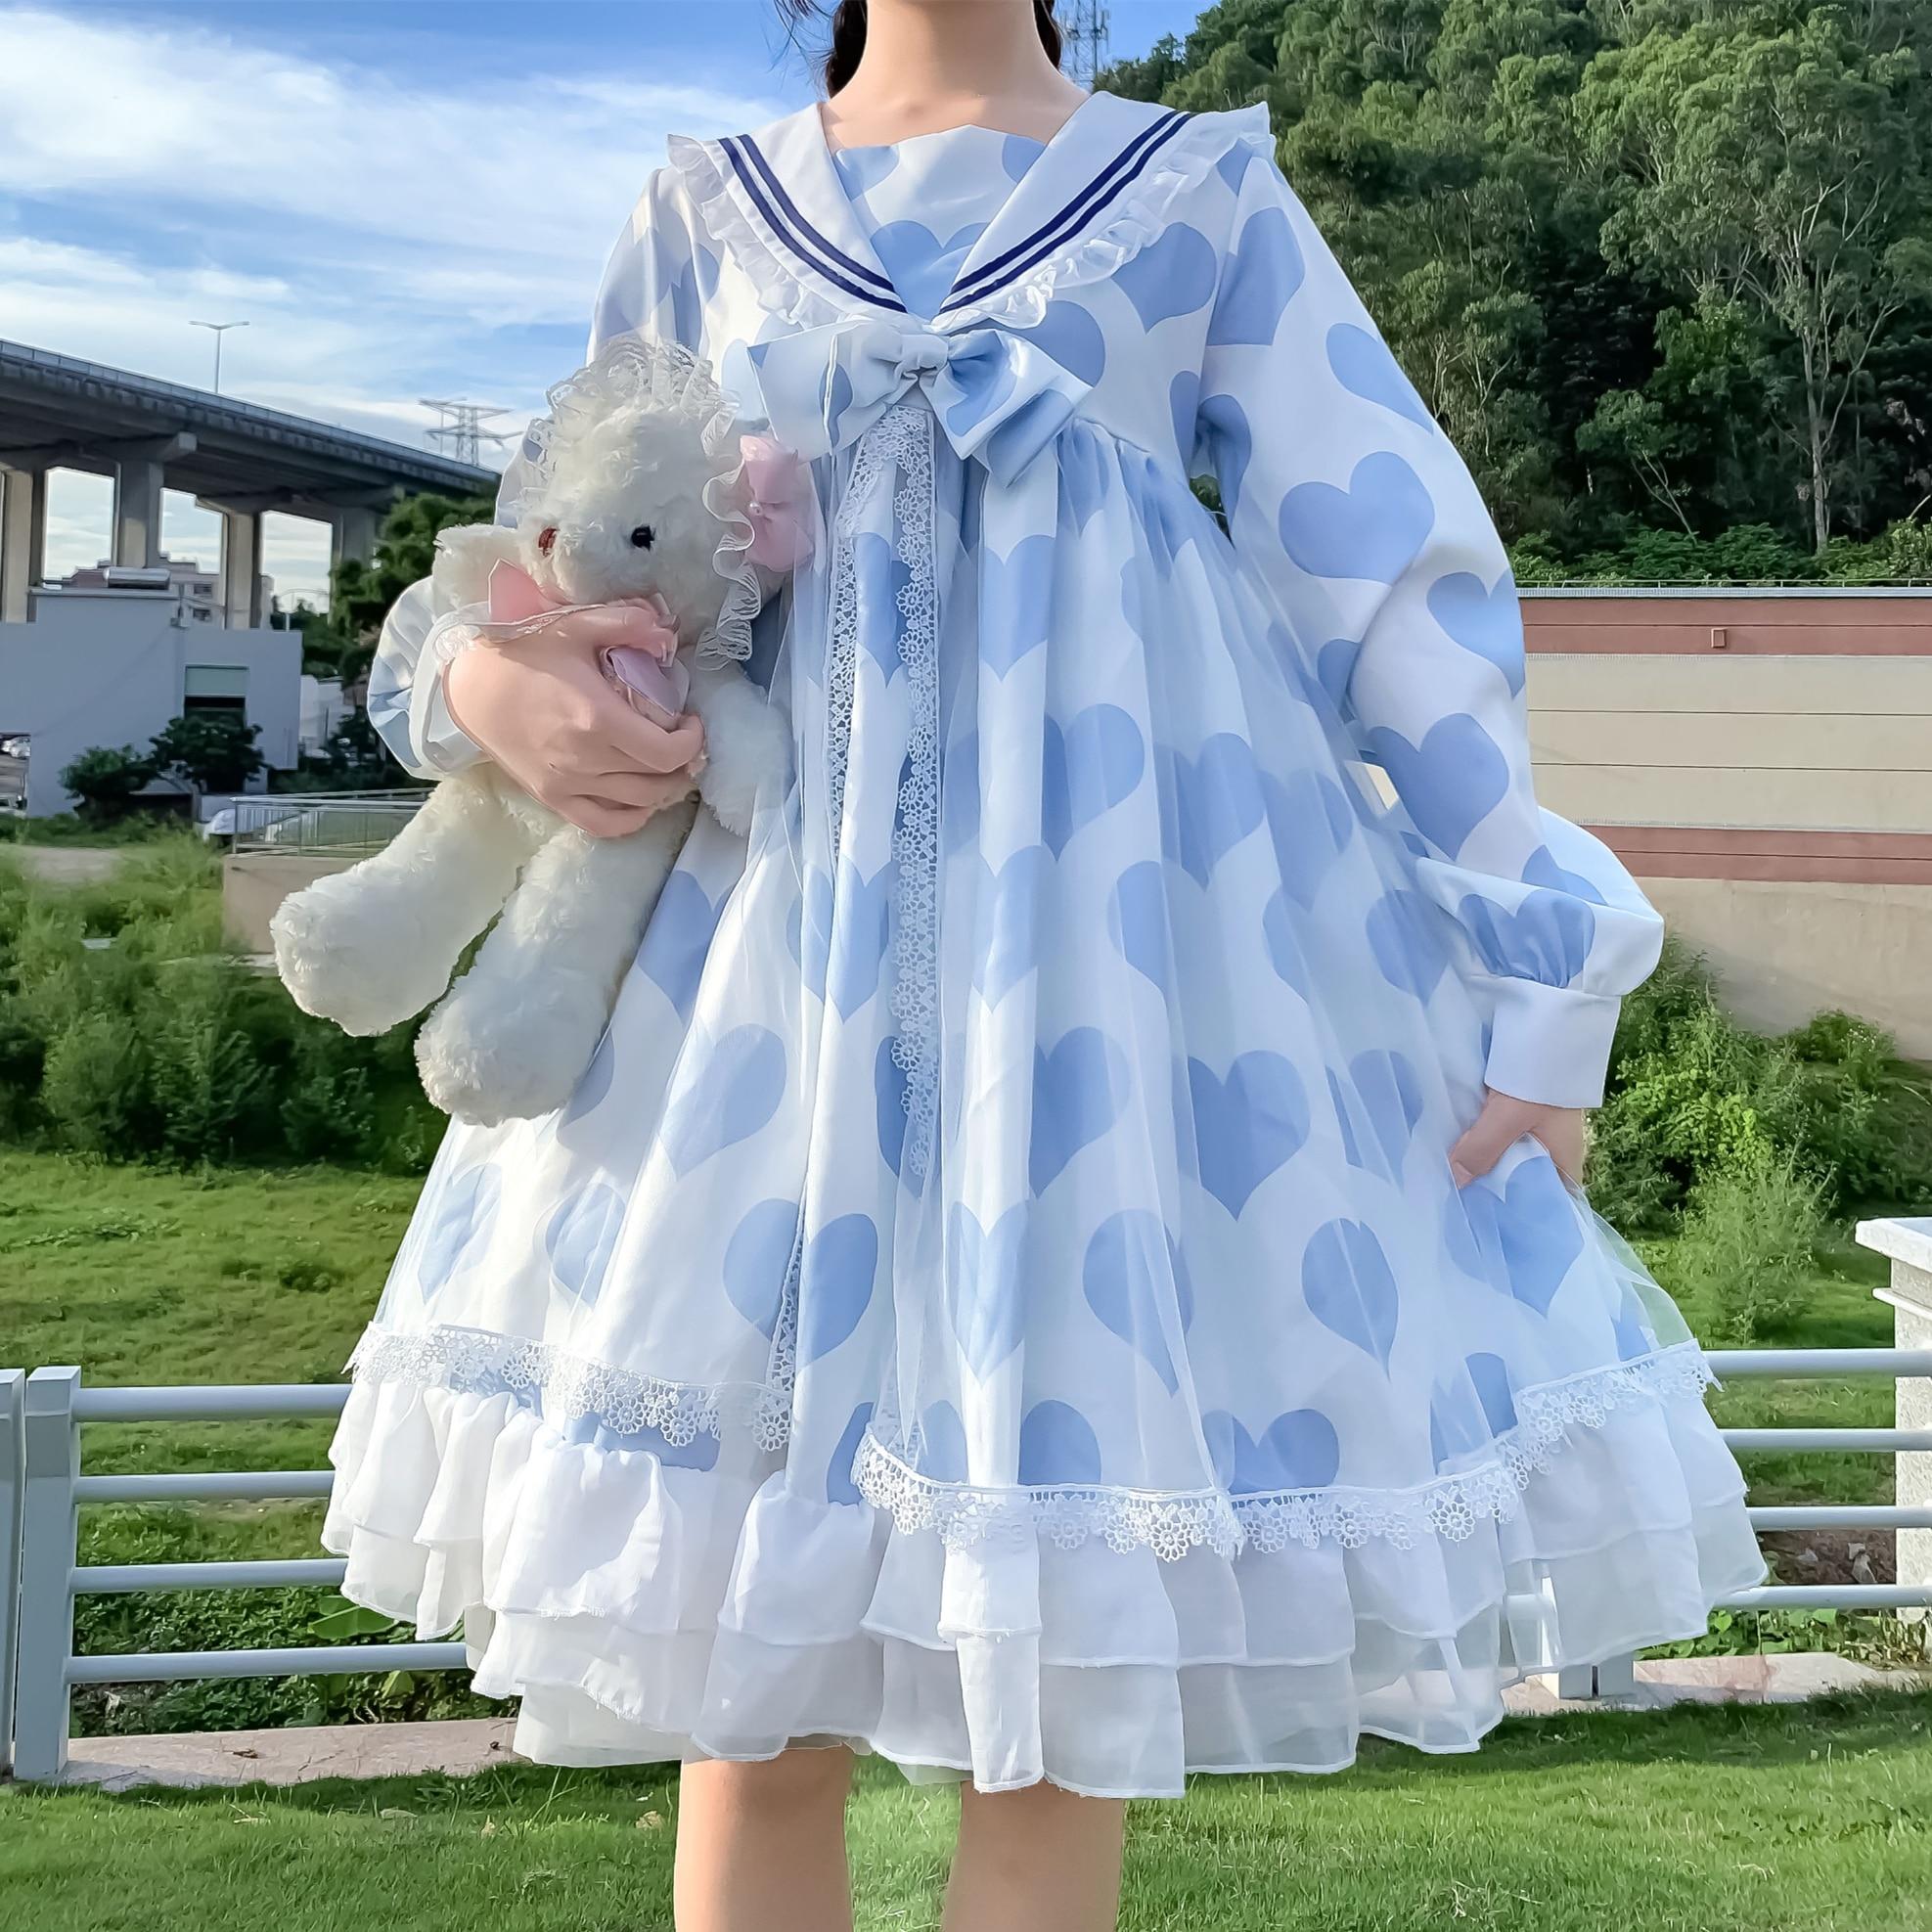 Japanese-Style Navy Op Long-Sleeved Mesh Soft Sister Ruffles Dress Women Spring and Autumn kawaii clothing sweet lolita dress